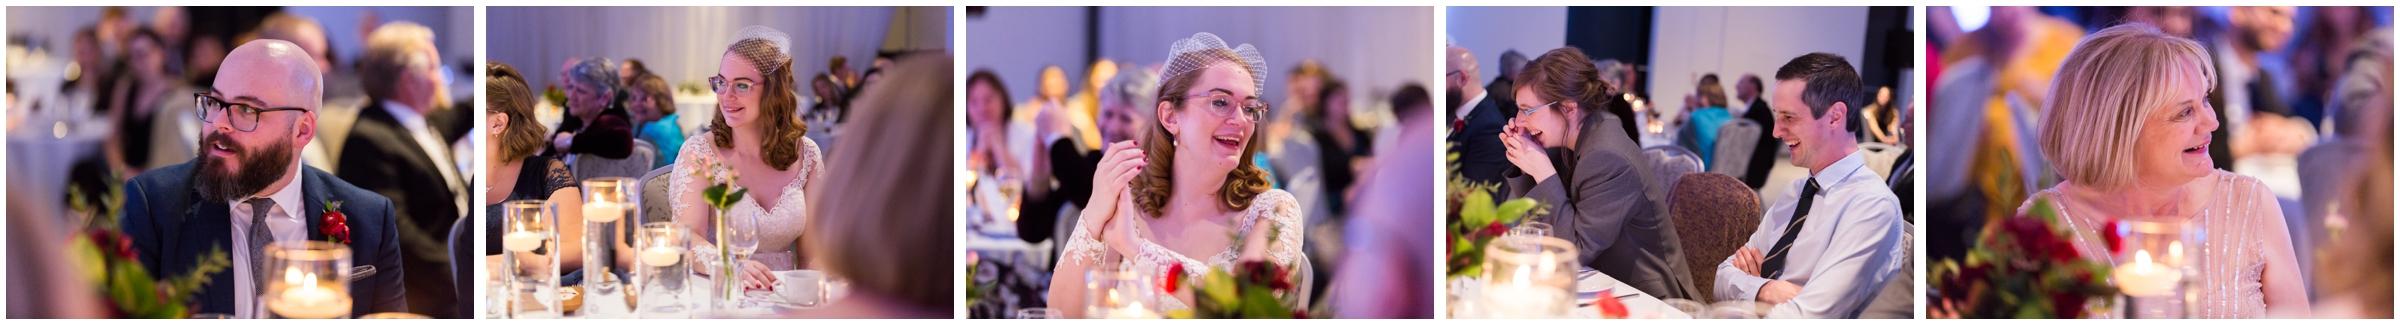 Ottaw Wedding Allison Andrew - (Selena Phillips-Boyle)_0084.jpg